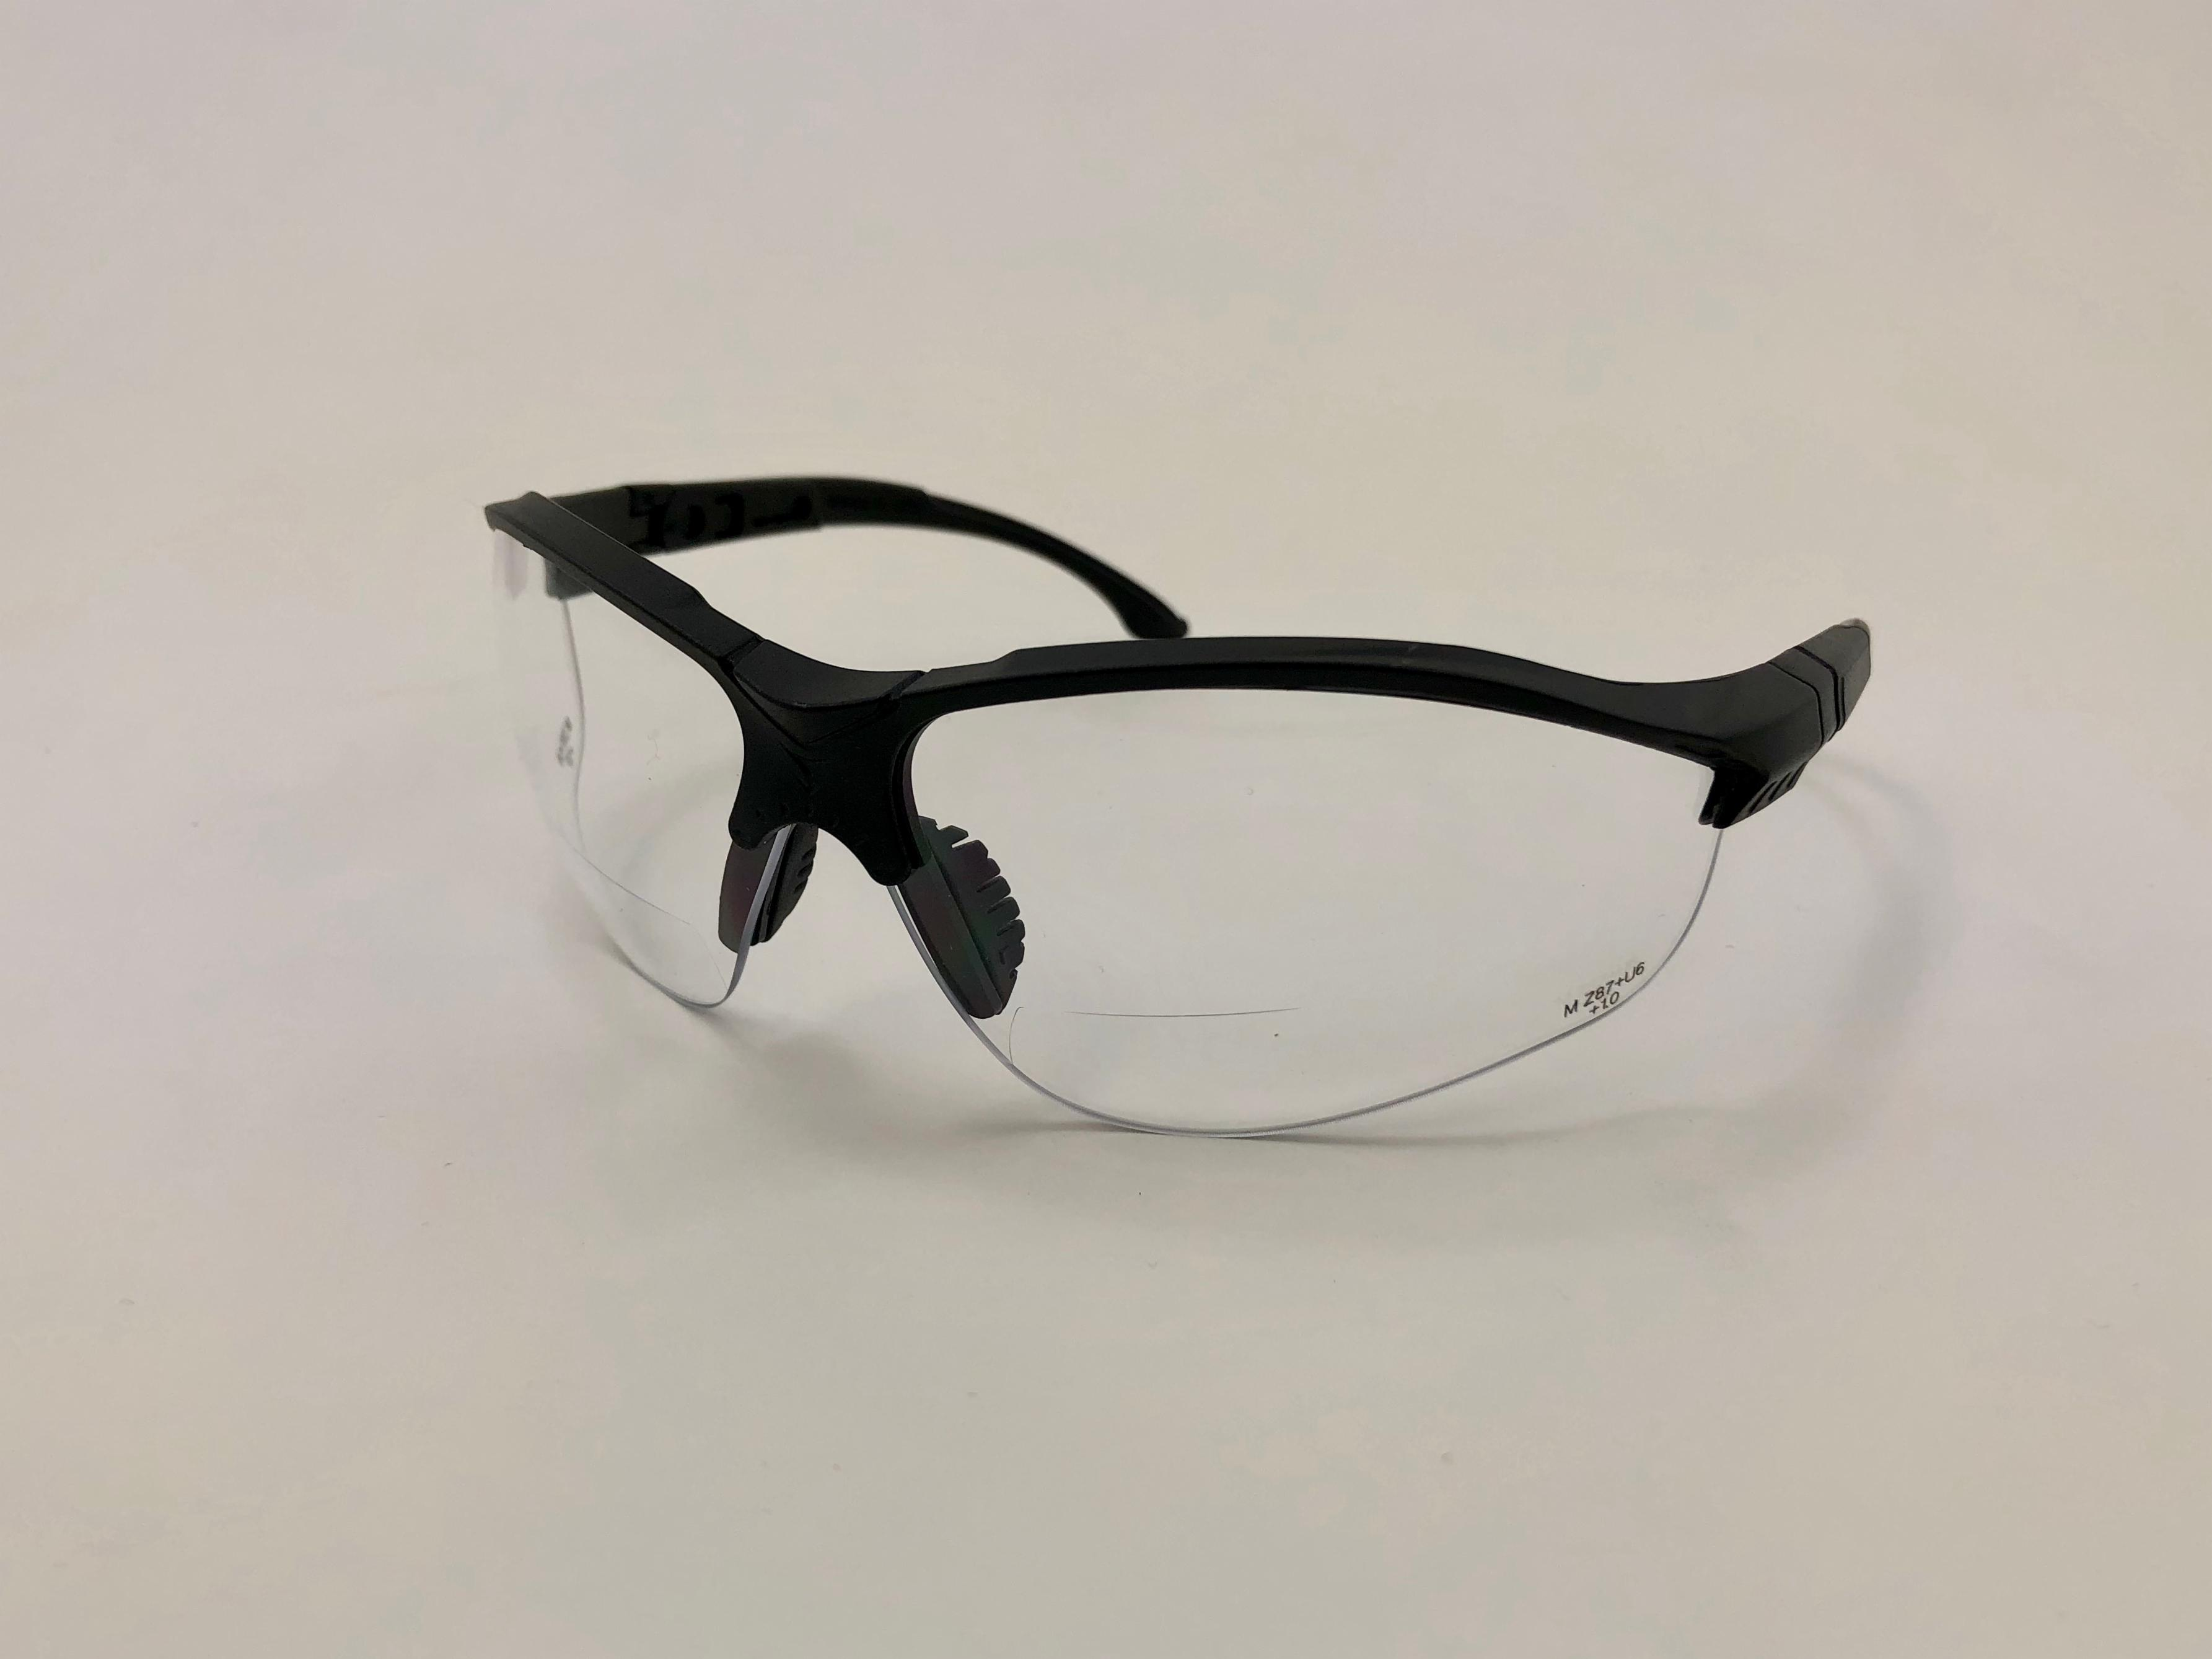 Diamond M DM-SG1000C 1000 Series Visitor Specs, Clear Lens